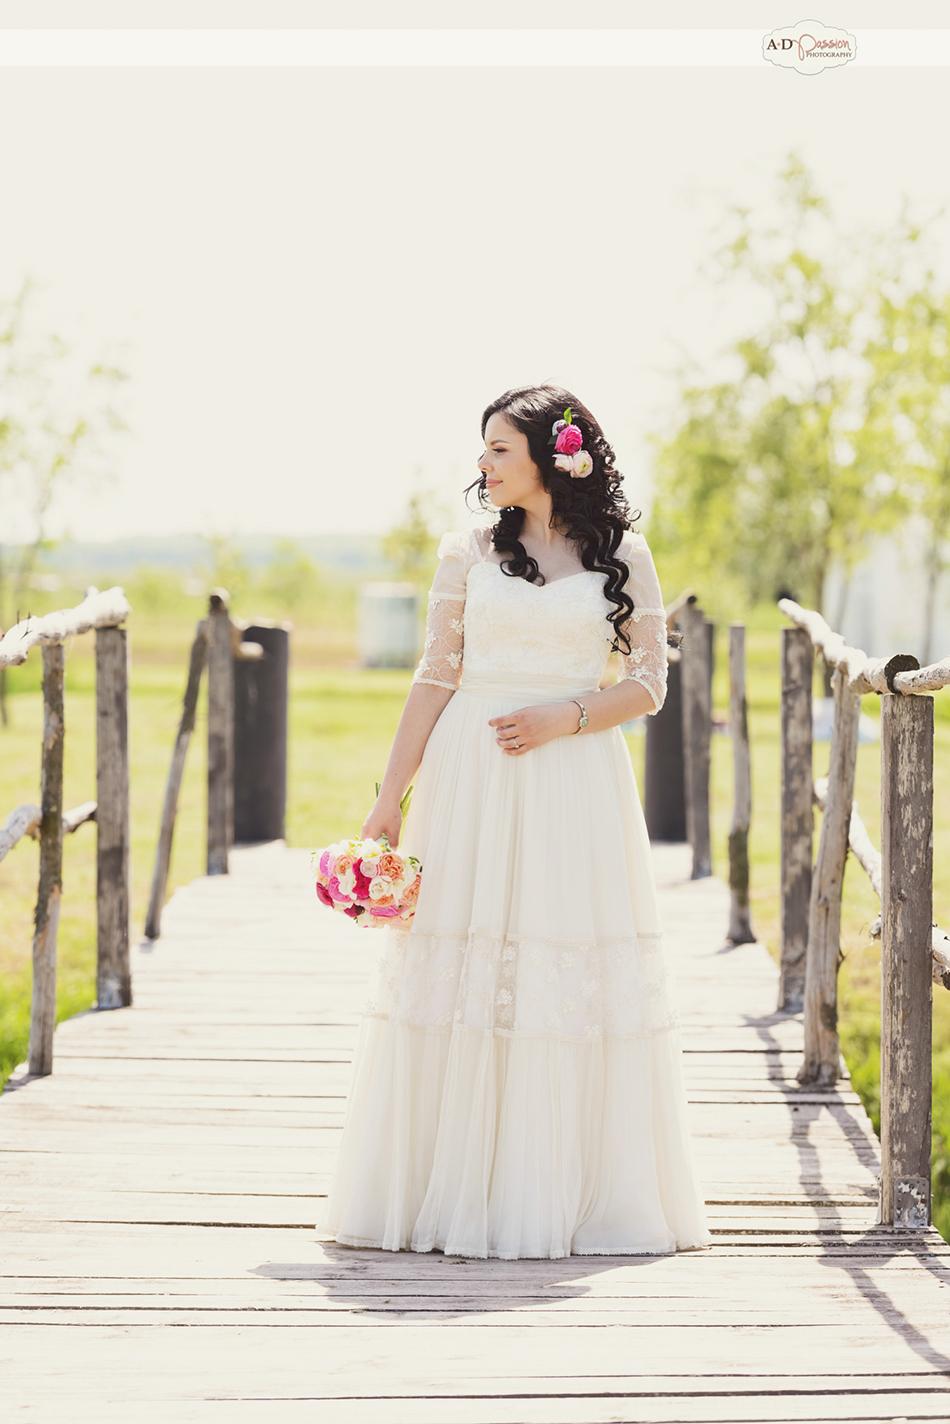 AD Passion Photography | 20140428_fotograf-nunta-timisoara_cristina_si_emanuel_0081 | Adelin, Dida, fotograf profesionist, fotograf de nunta, fotografie de nunta, fotograf Timisoara, fotograf Craiova, fotograf Bucuresti, fotograf Arad, nunta Timisoara, nunta Arad, nunta Bucuresti, nunta Craiova